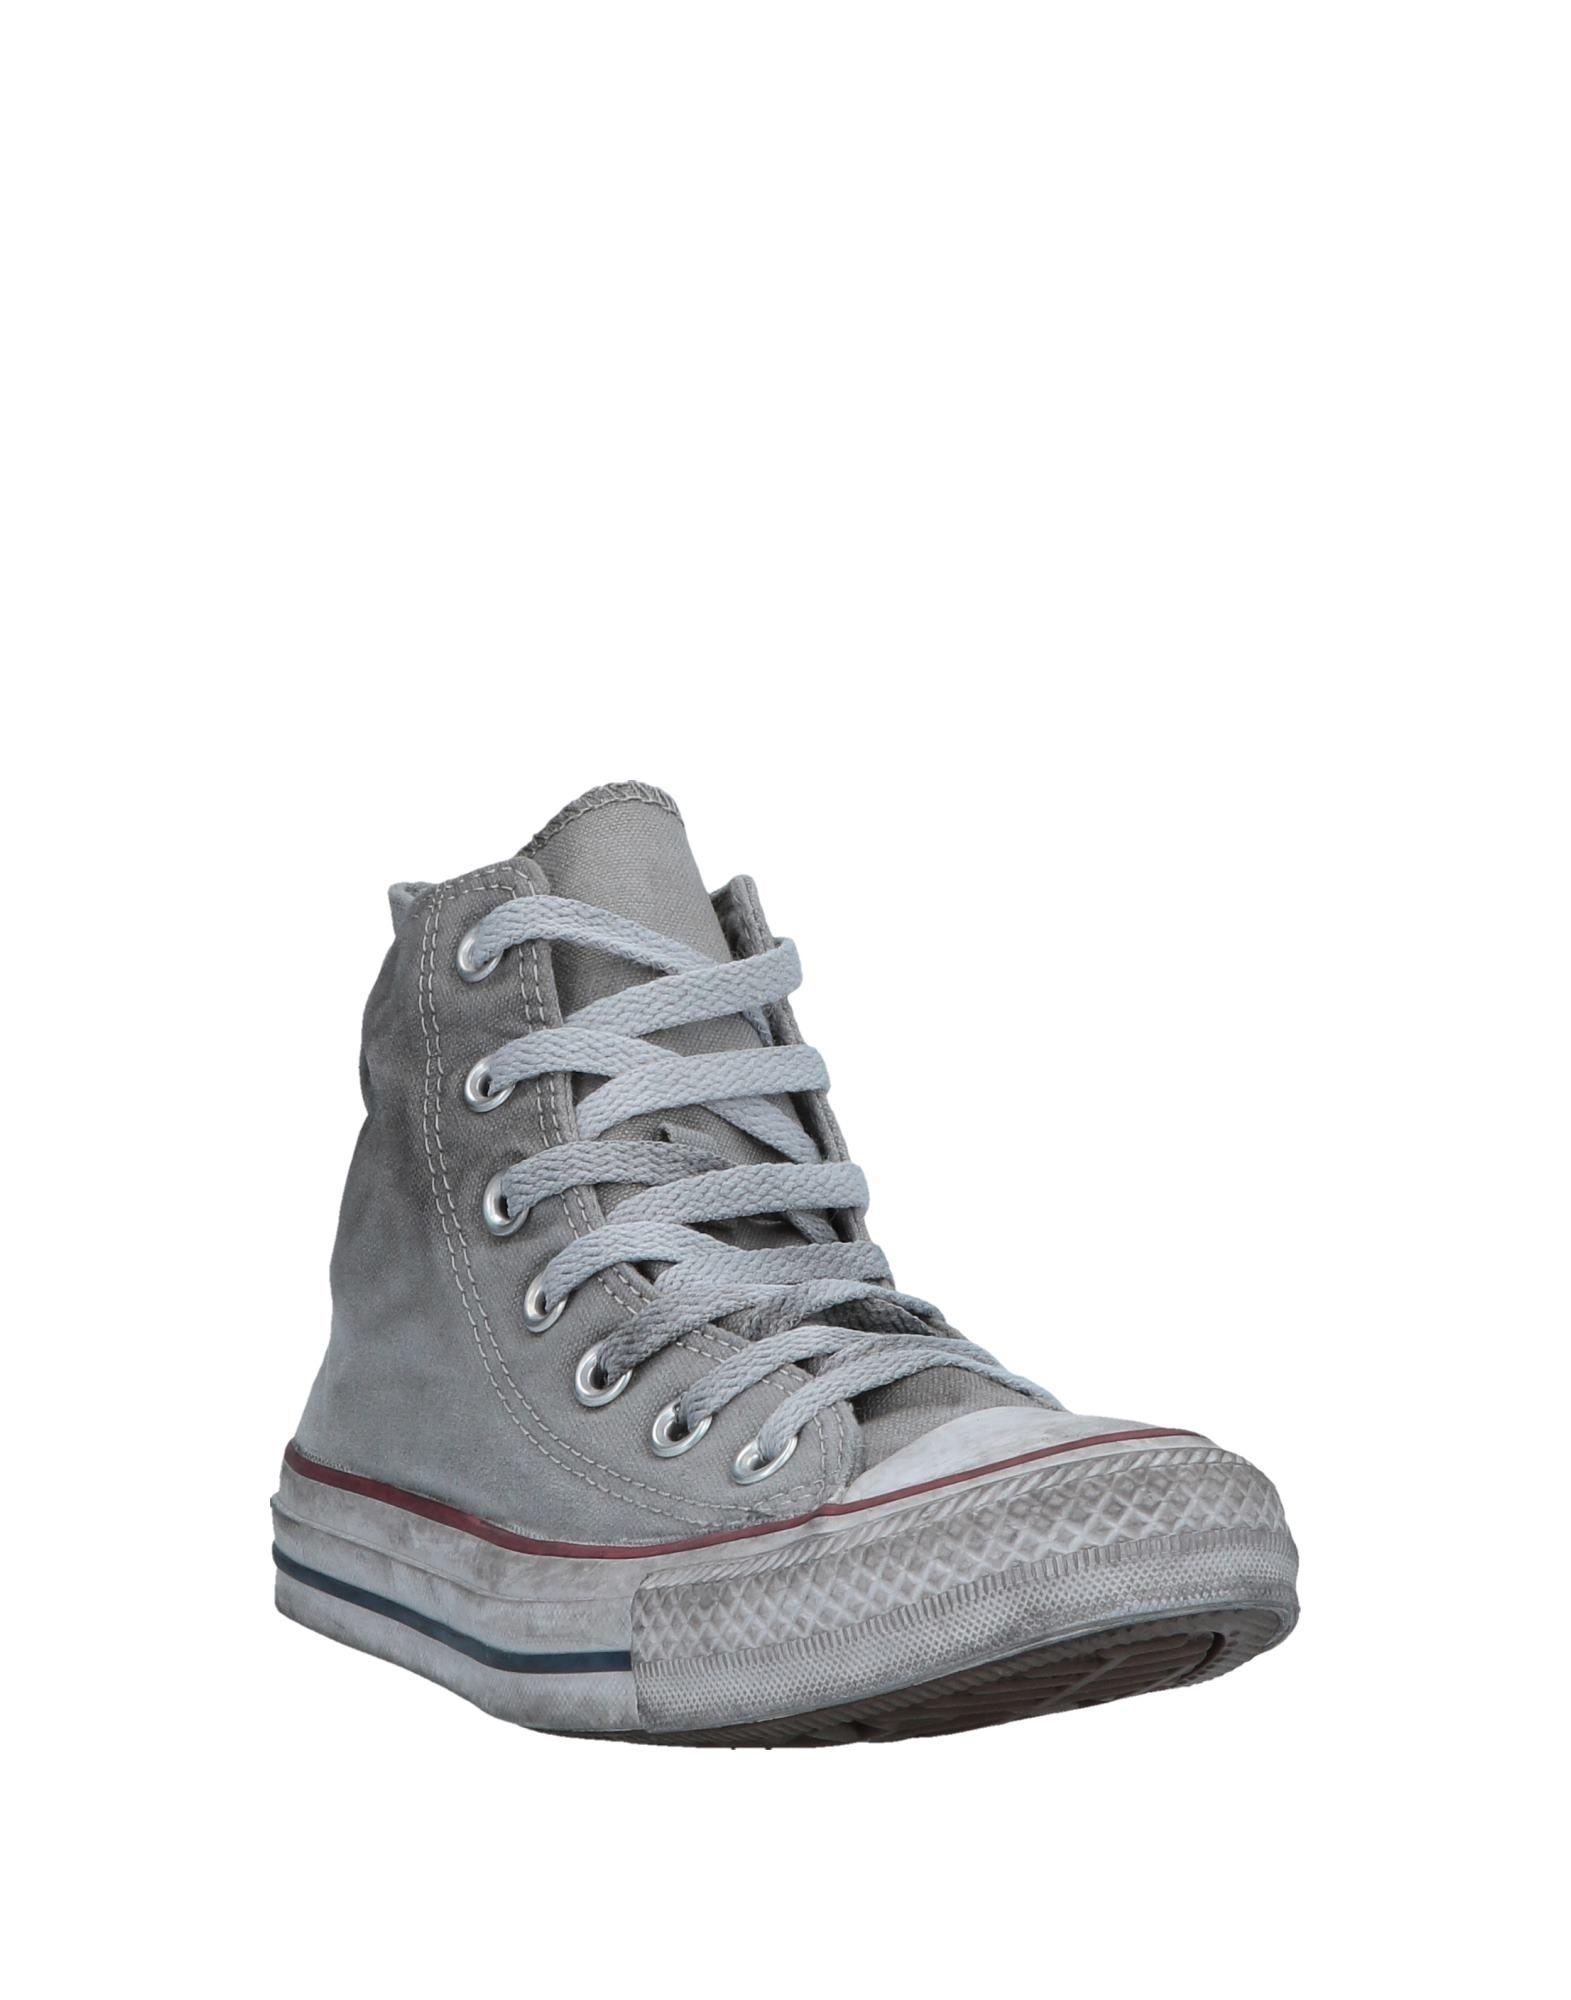 cbe7d48c840 CONVERSE LIMITED EDITION ΠΑΠΟΥΤΣΙΑ Χαμηλά sneakers, Γυναικεία sneakers,  ΓΥΝΑΙΚΑ   ΠΑΠΟΥΤΣΙΑ   SNEAKERS